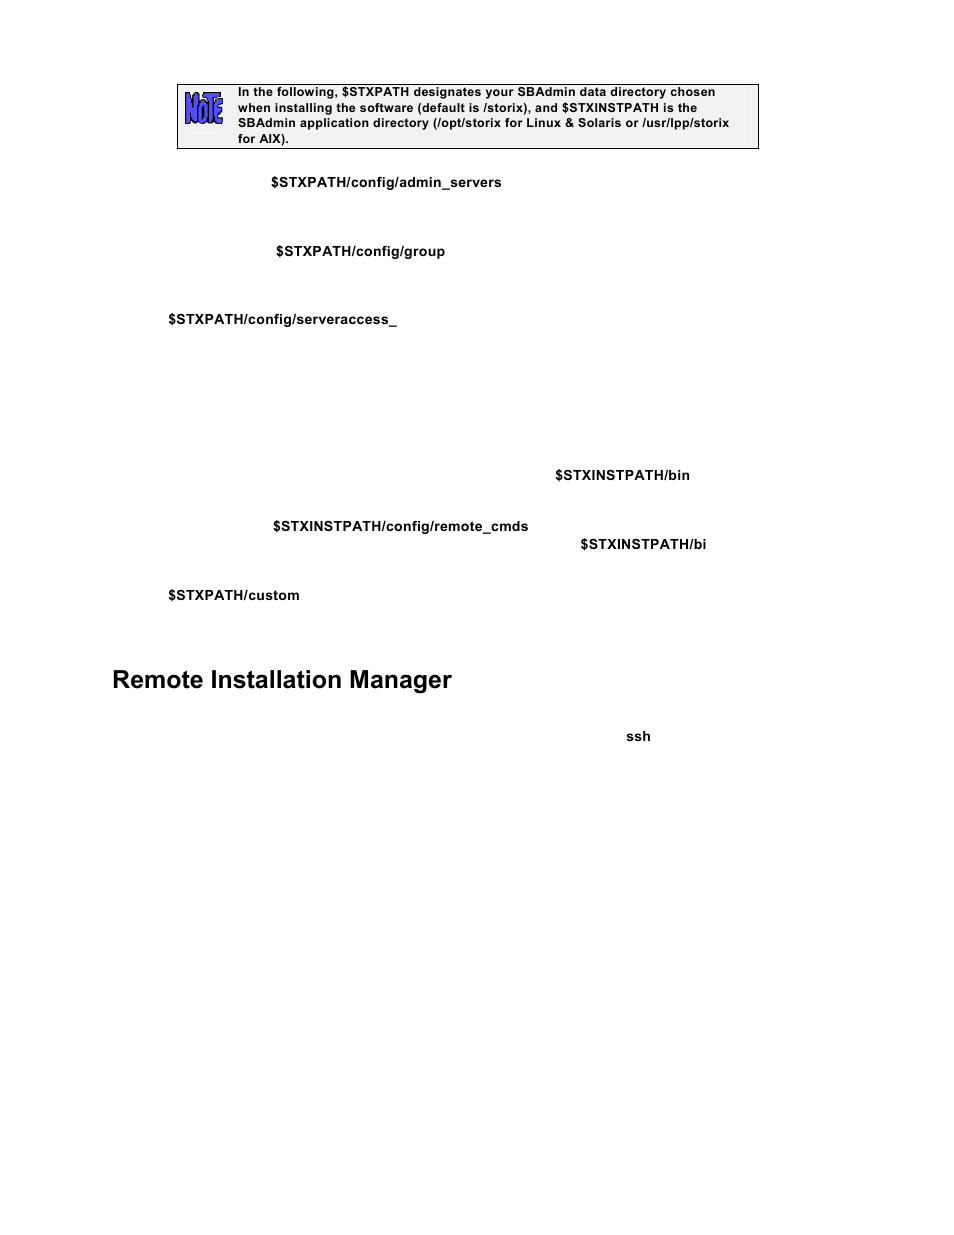 Remote installation manager | Storix Software SBAdmin TSM